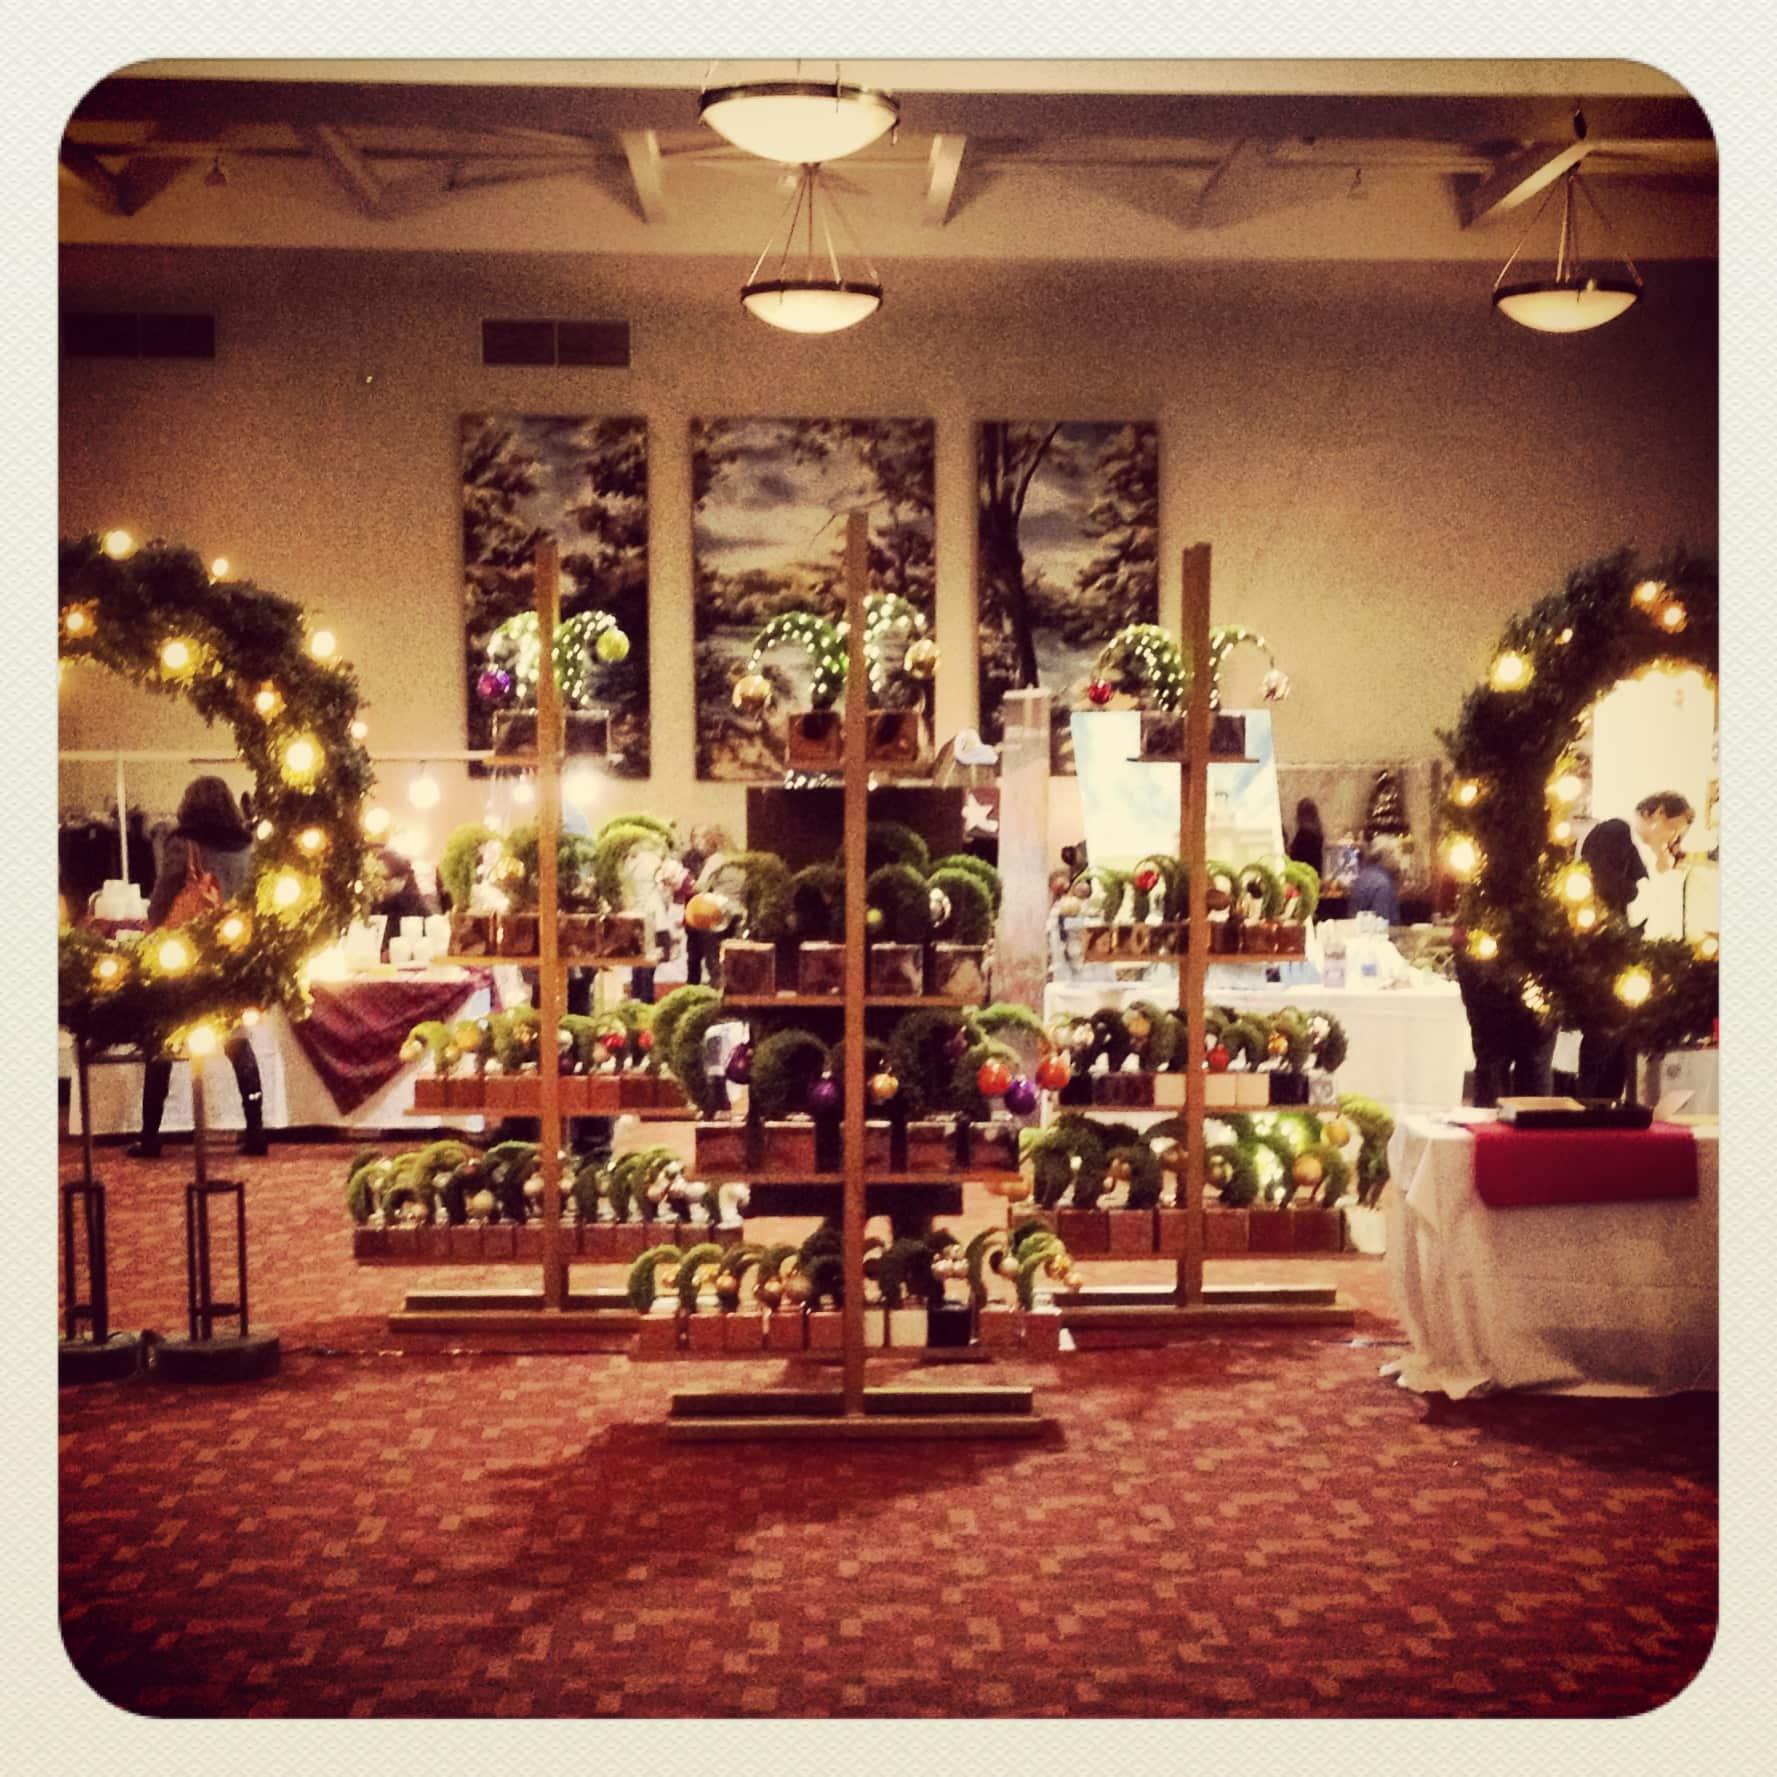 Christmas Village shopping at Deerhurst Resort